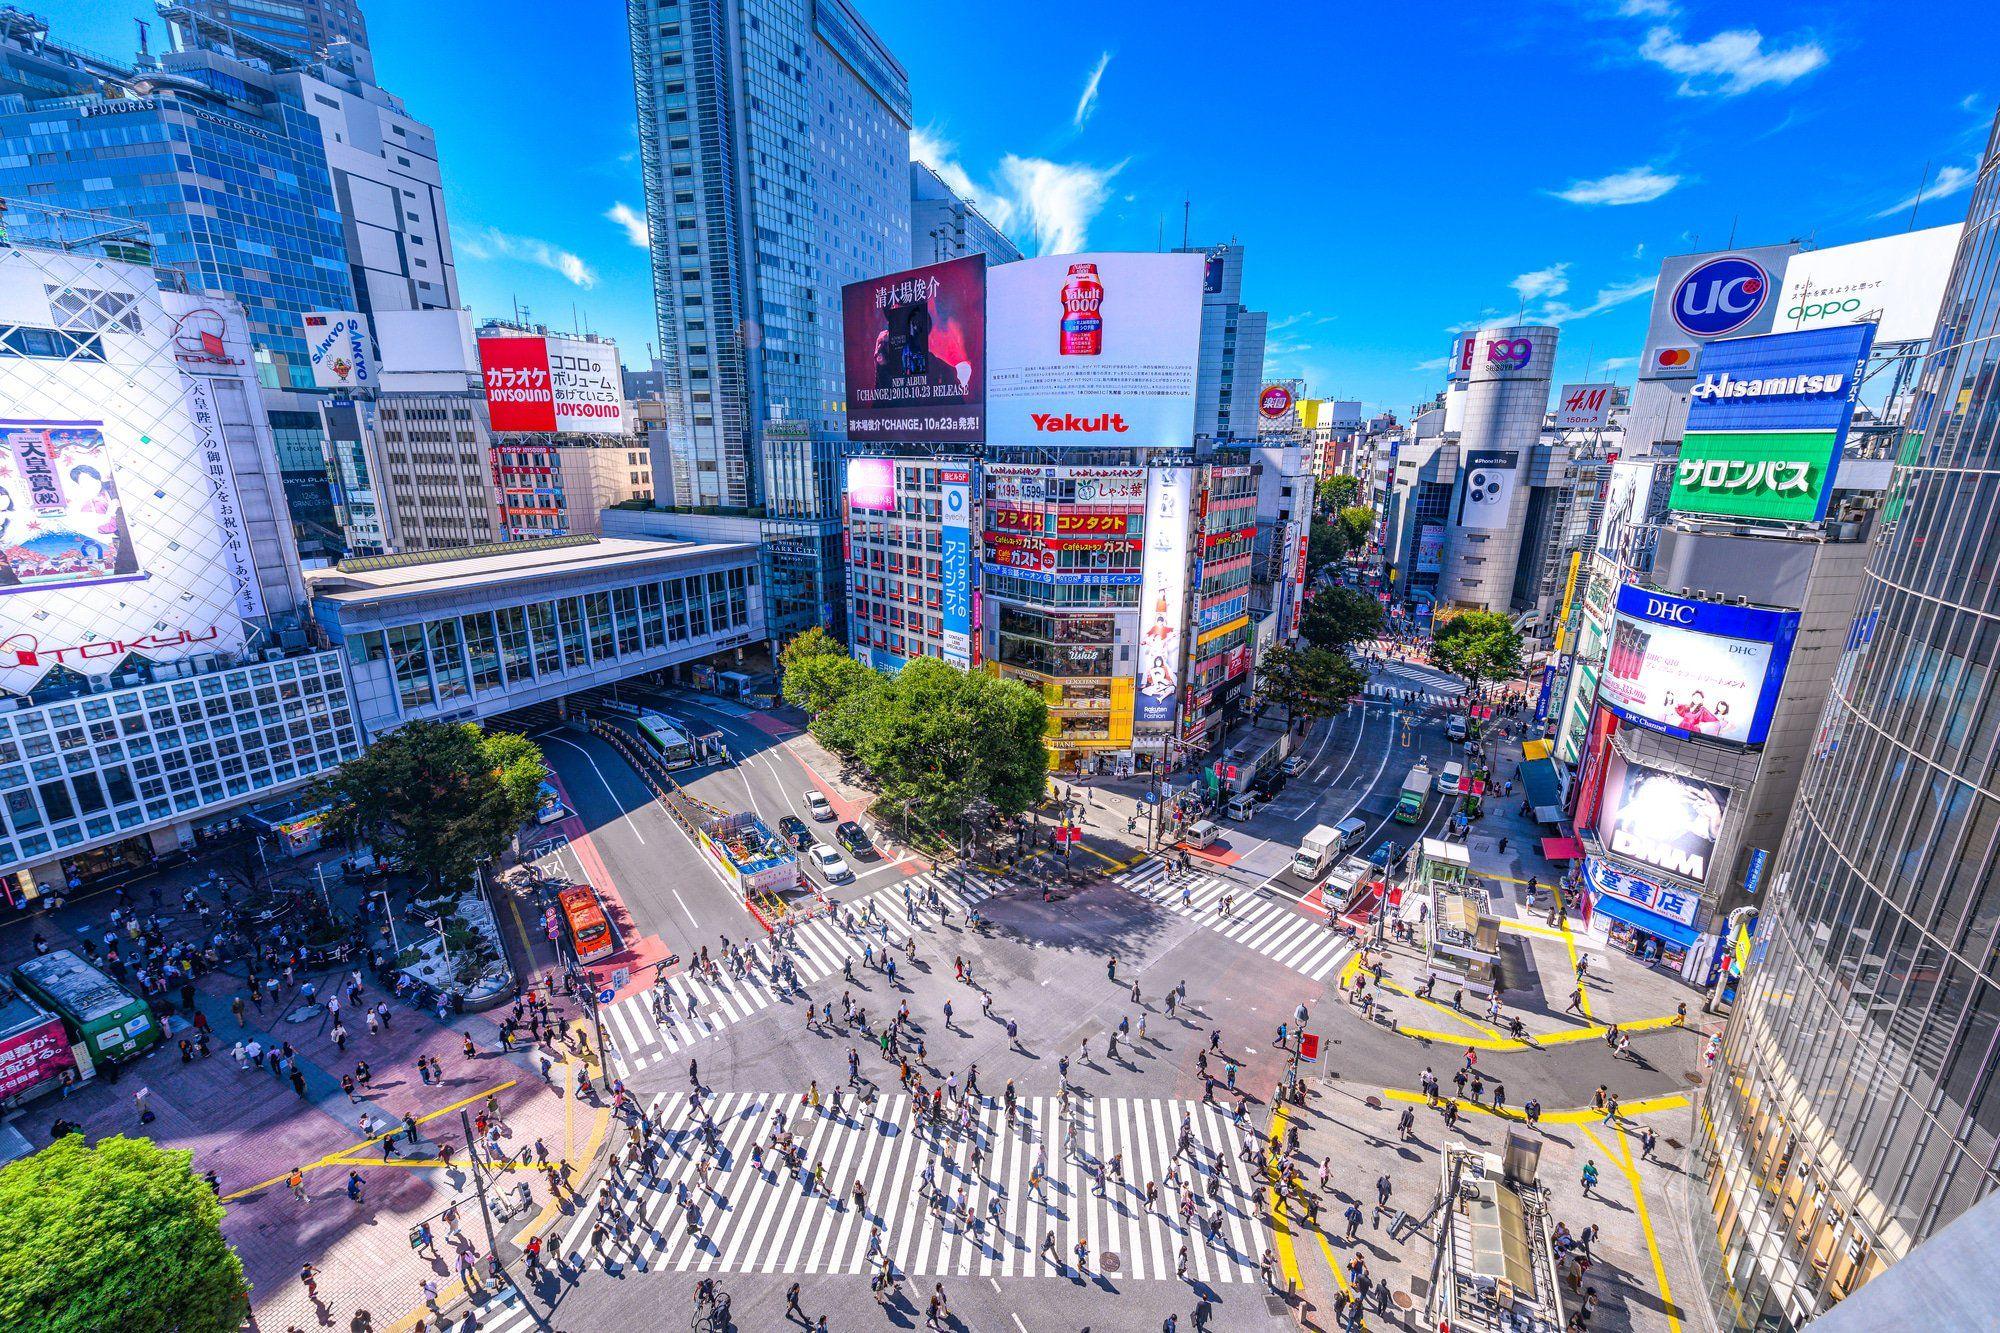 [vi] Culture conner Shibuya street